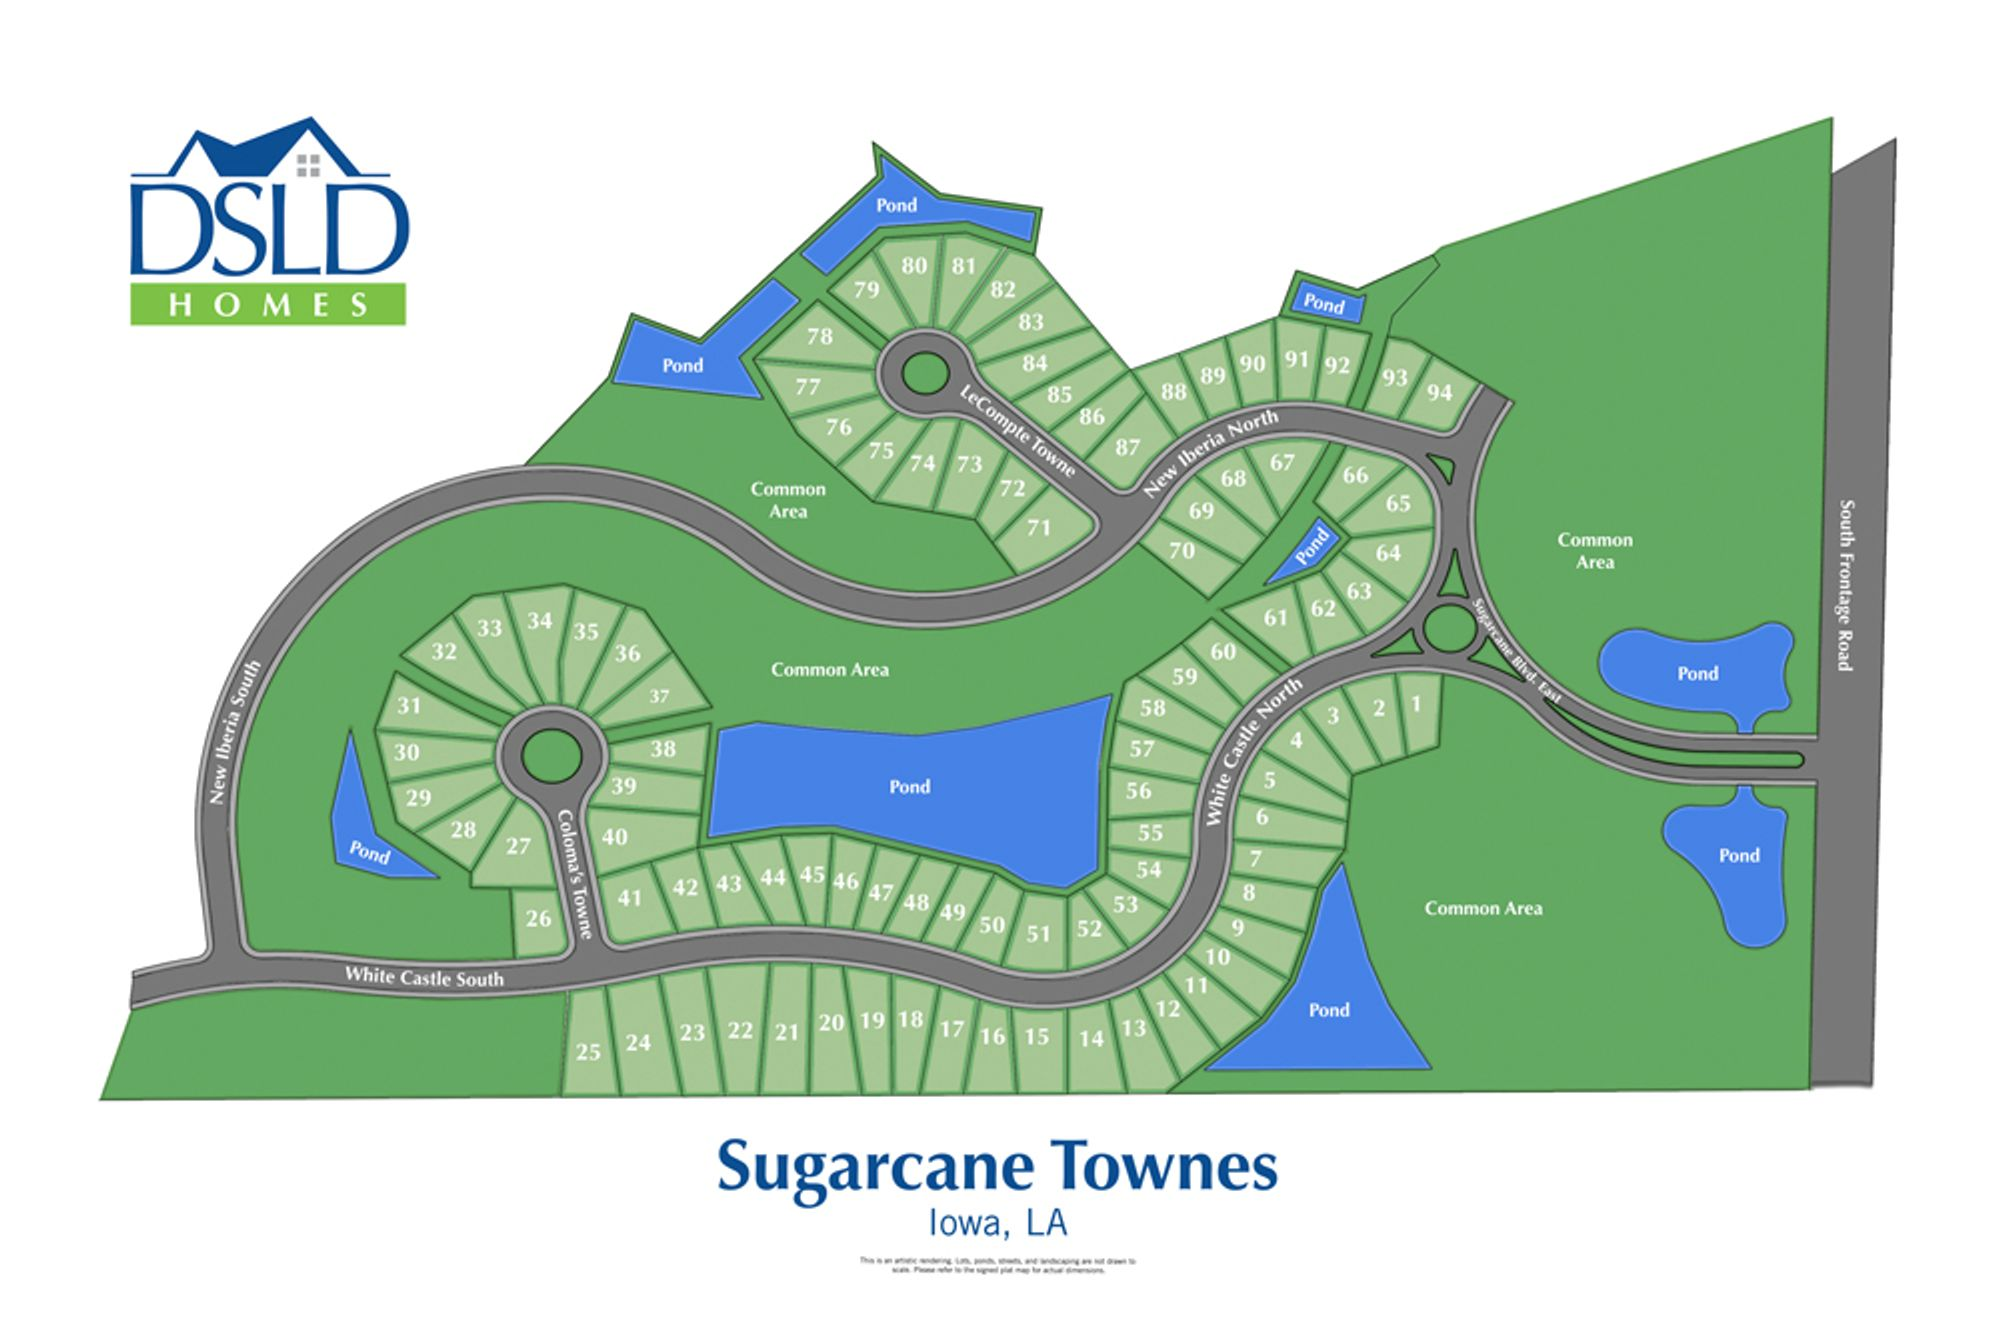 Sugarcane Townes